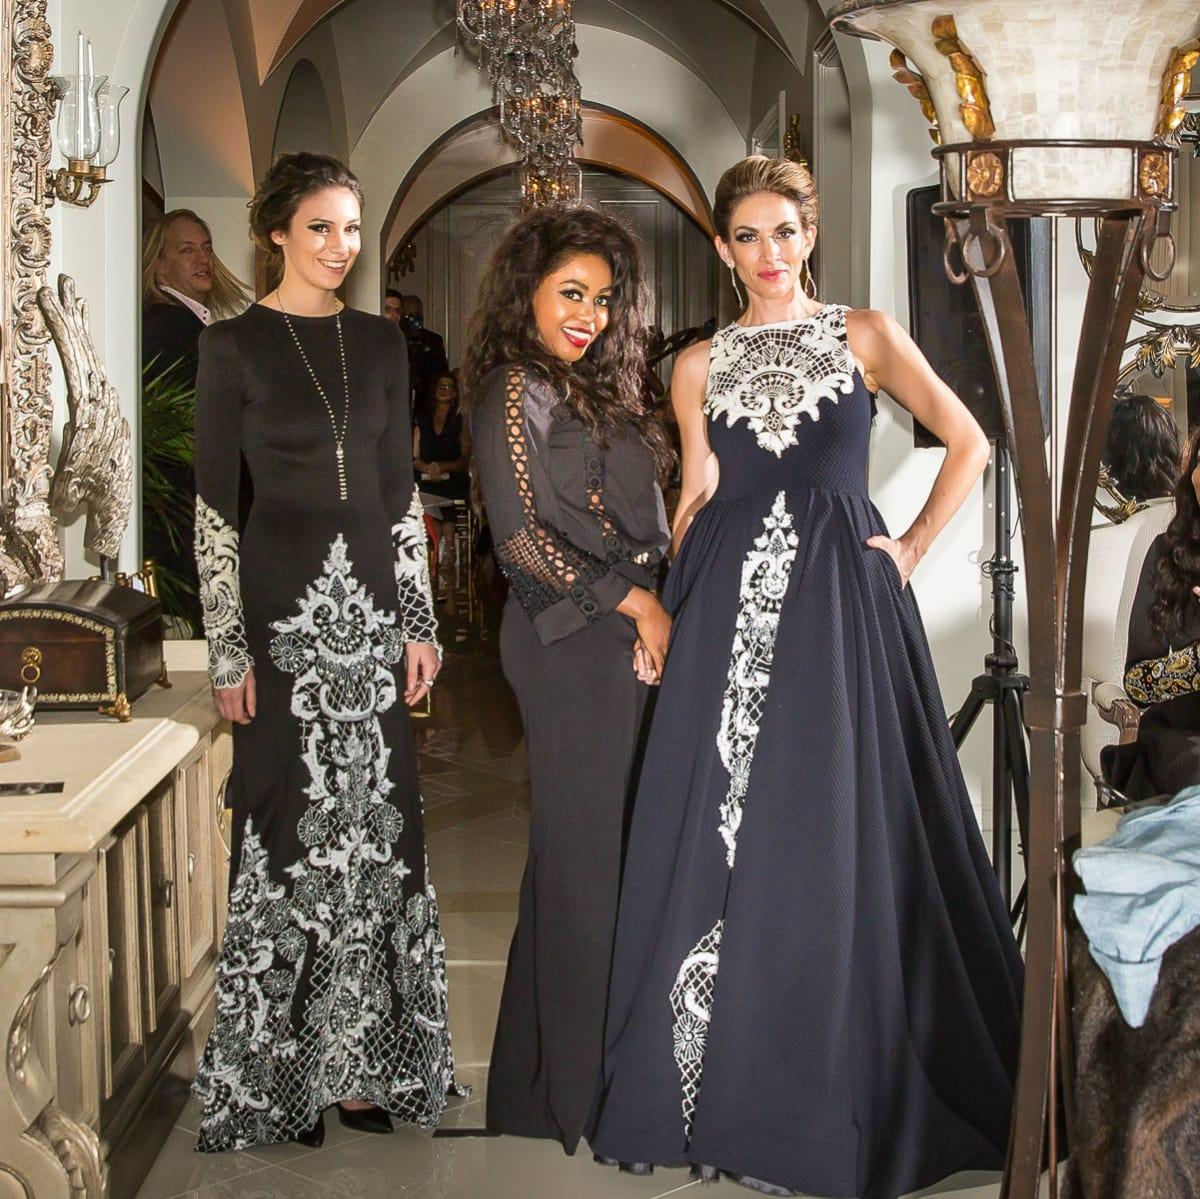 Esé Azénabor with models